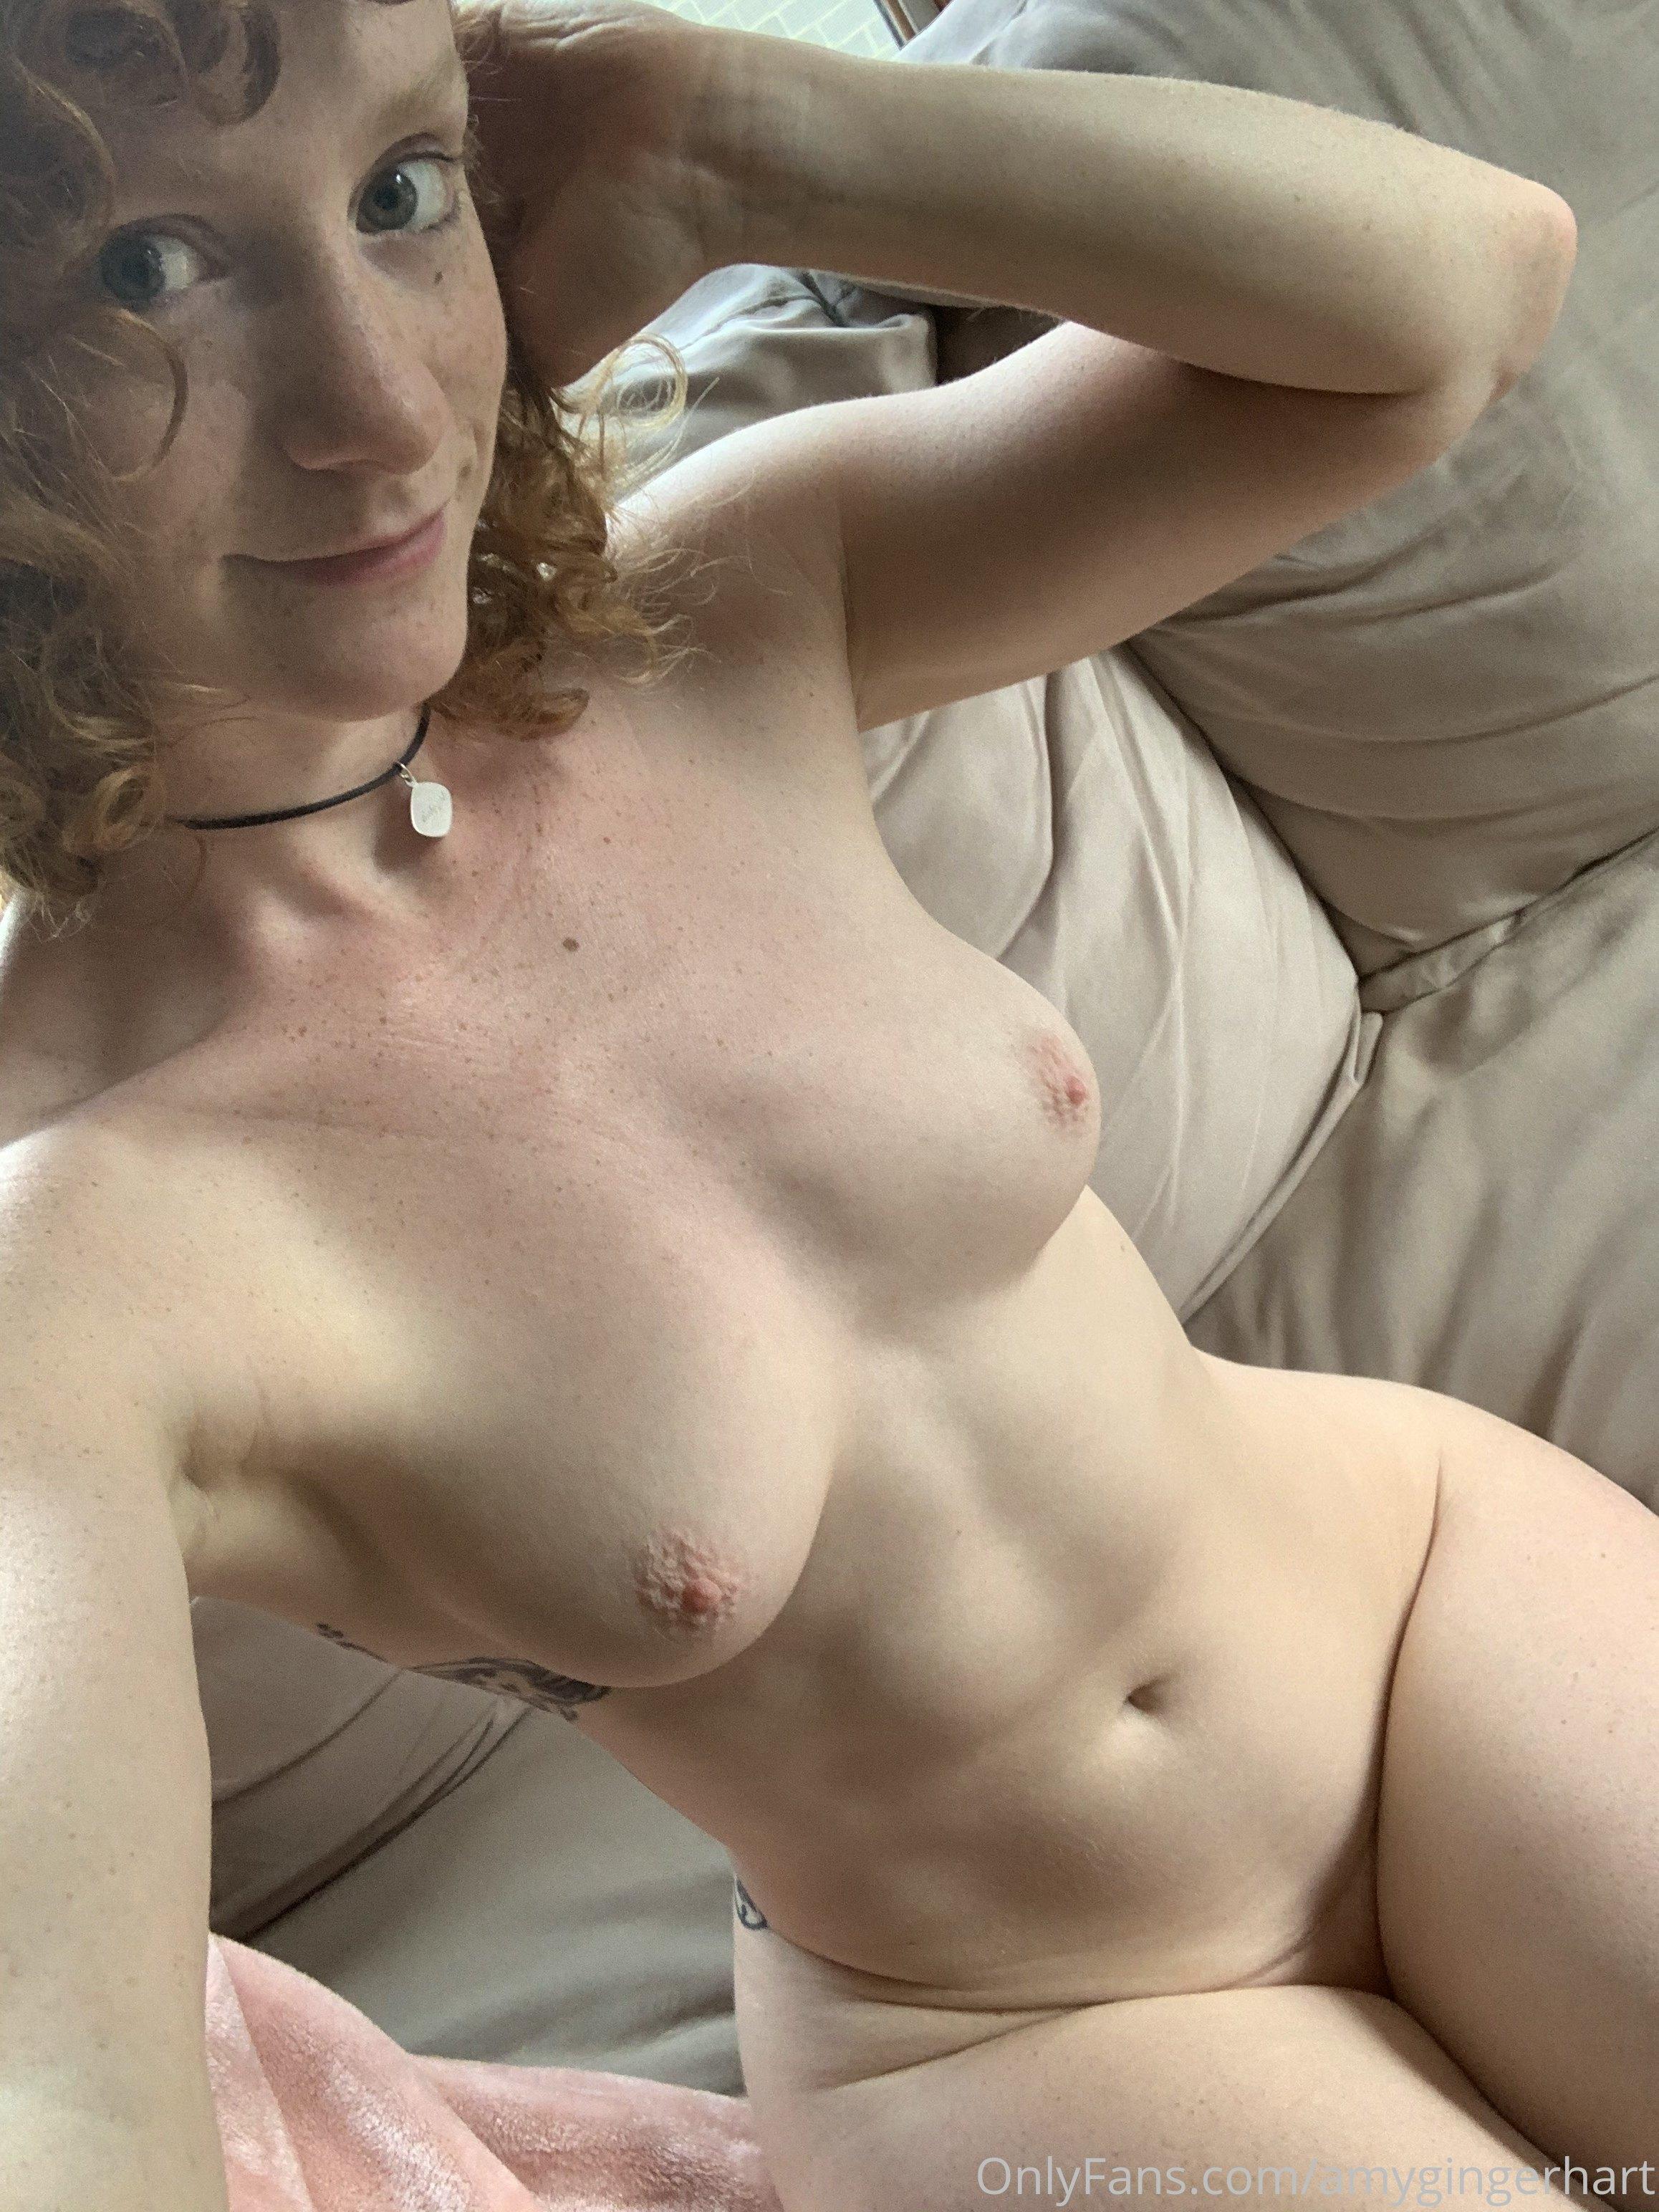 Amy Hart, Amygingerhart, Onlyfans 0334